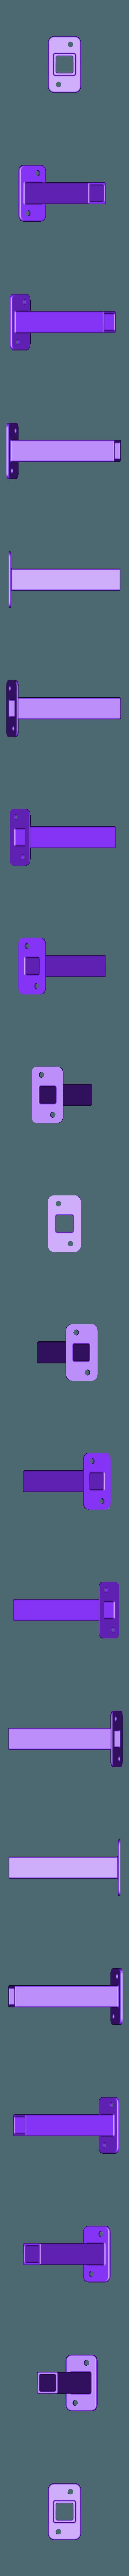 DFR_barrel_square.stl Download free STL file DFRobot Turtle Robot • 3D printable object, MakersBox